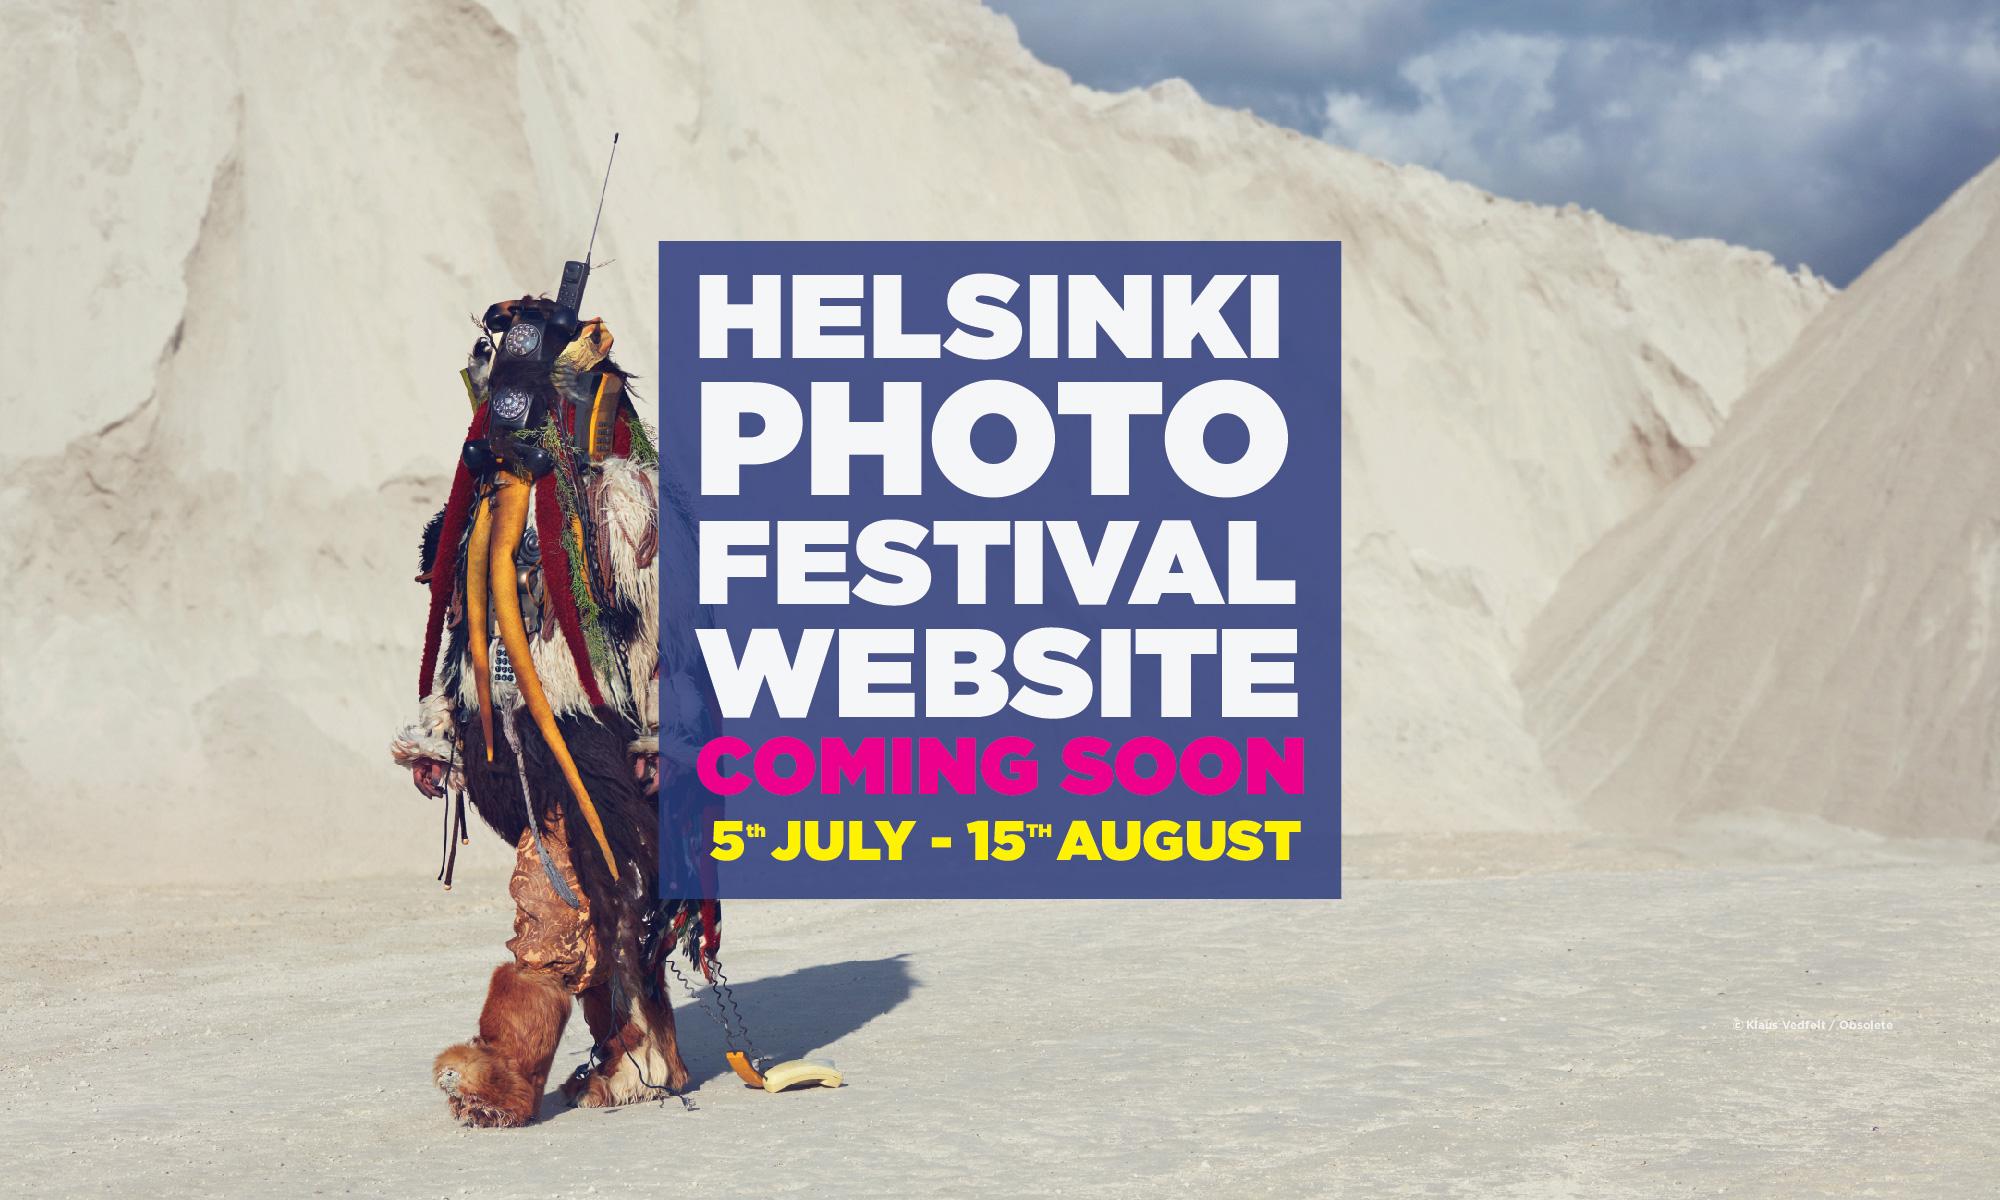 Helsinki Photo Festival 2018